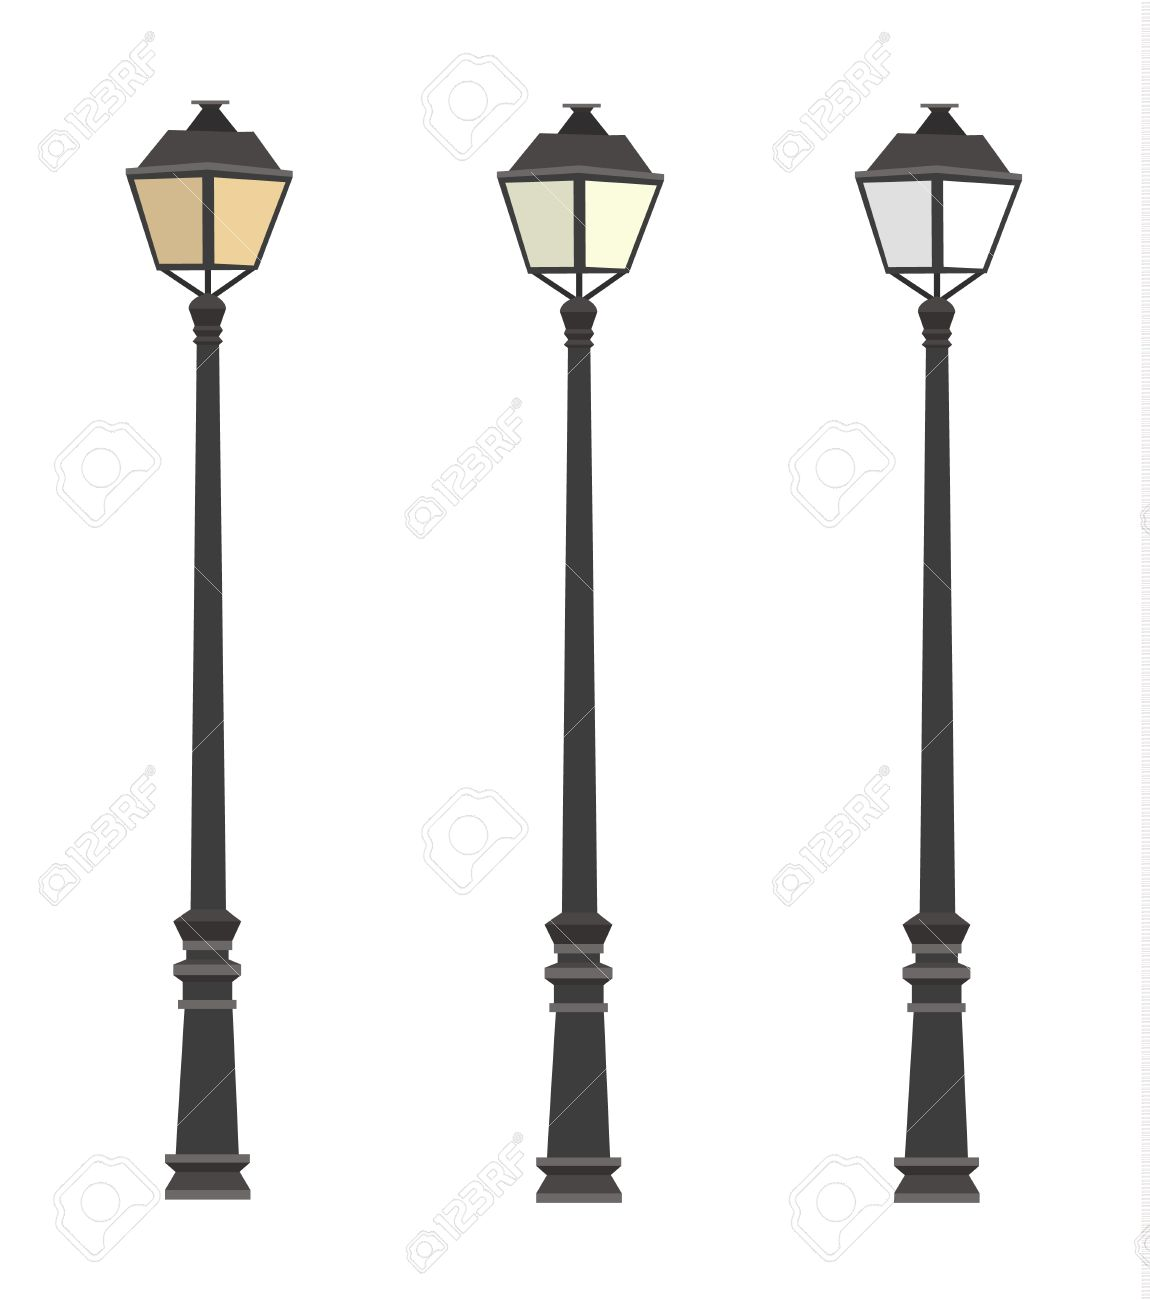 Lamppost lanterns street lights lamp post royalty free cliparts street lights lamp post stock vector 67965053 aloadofball Choice Image